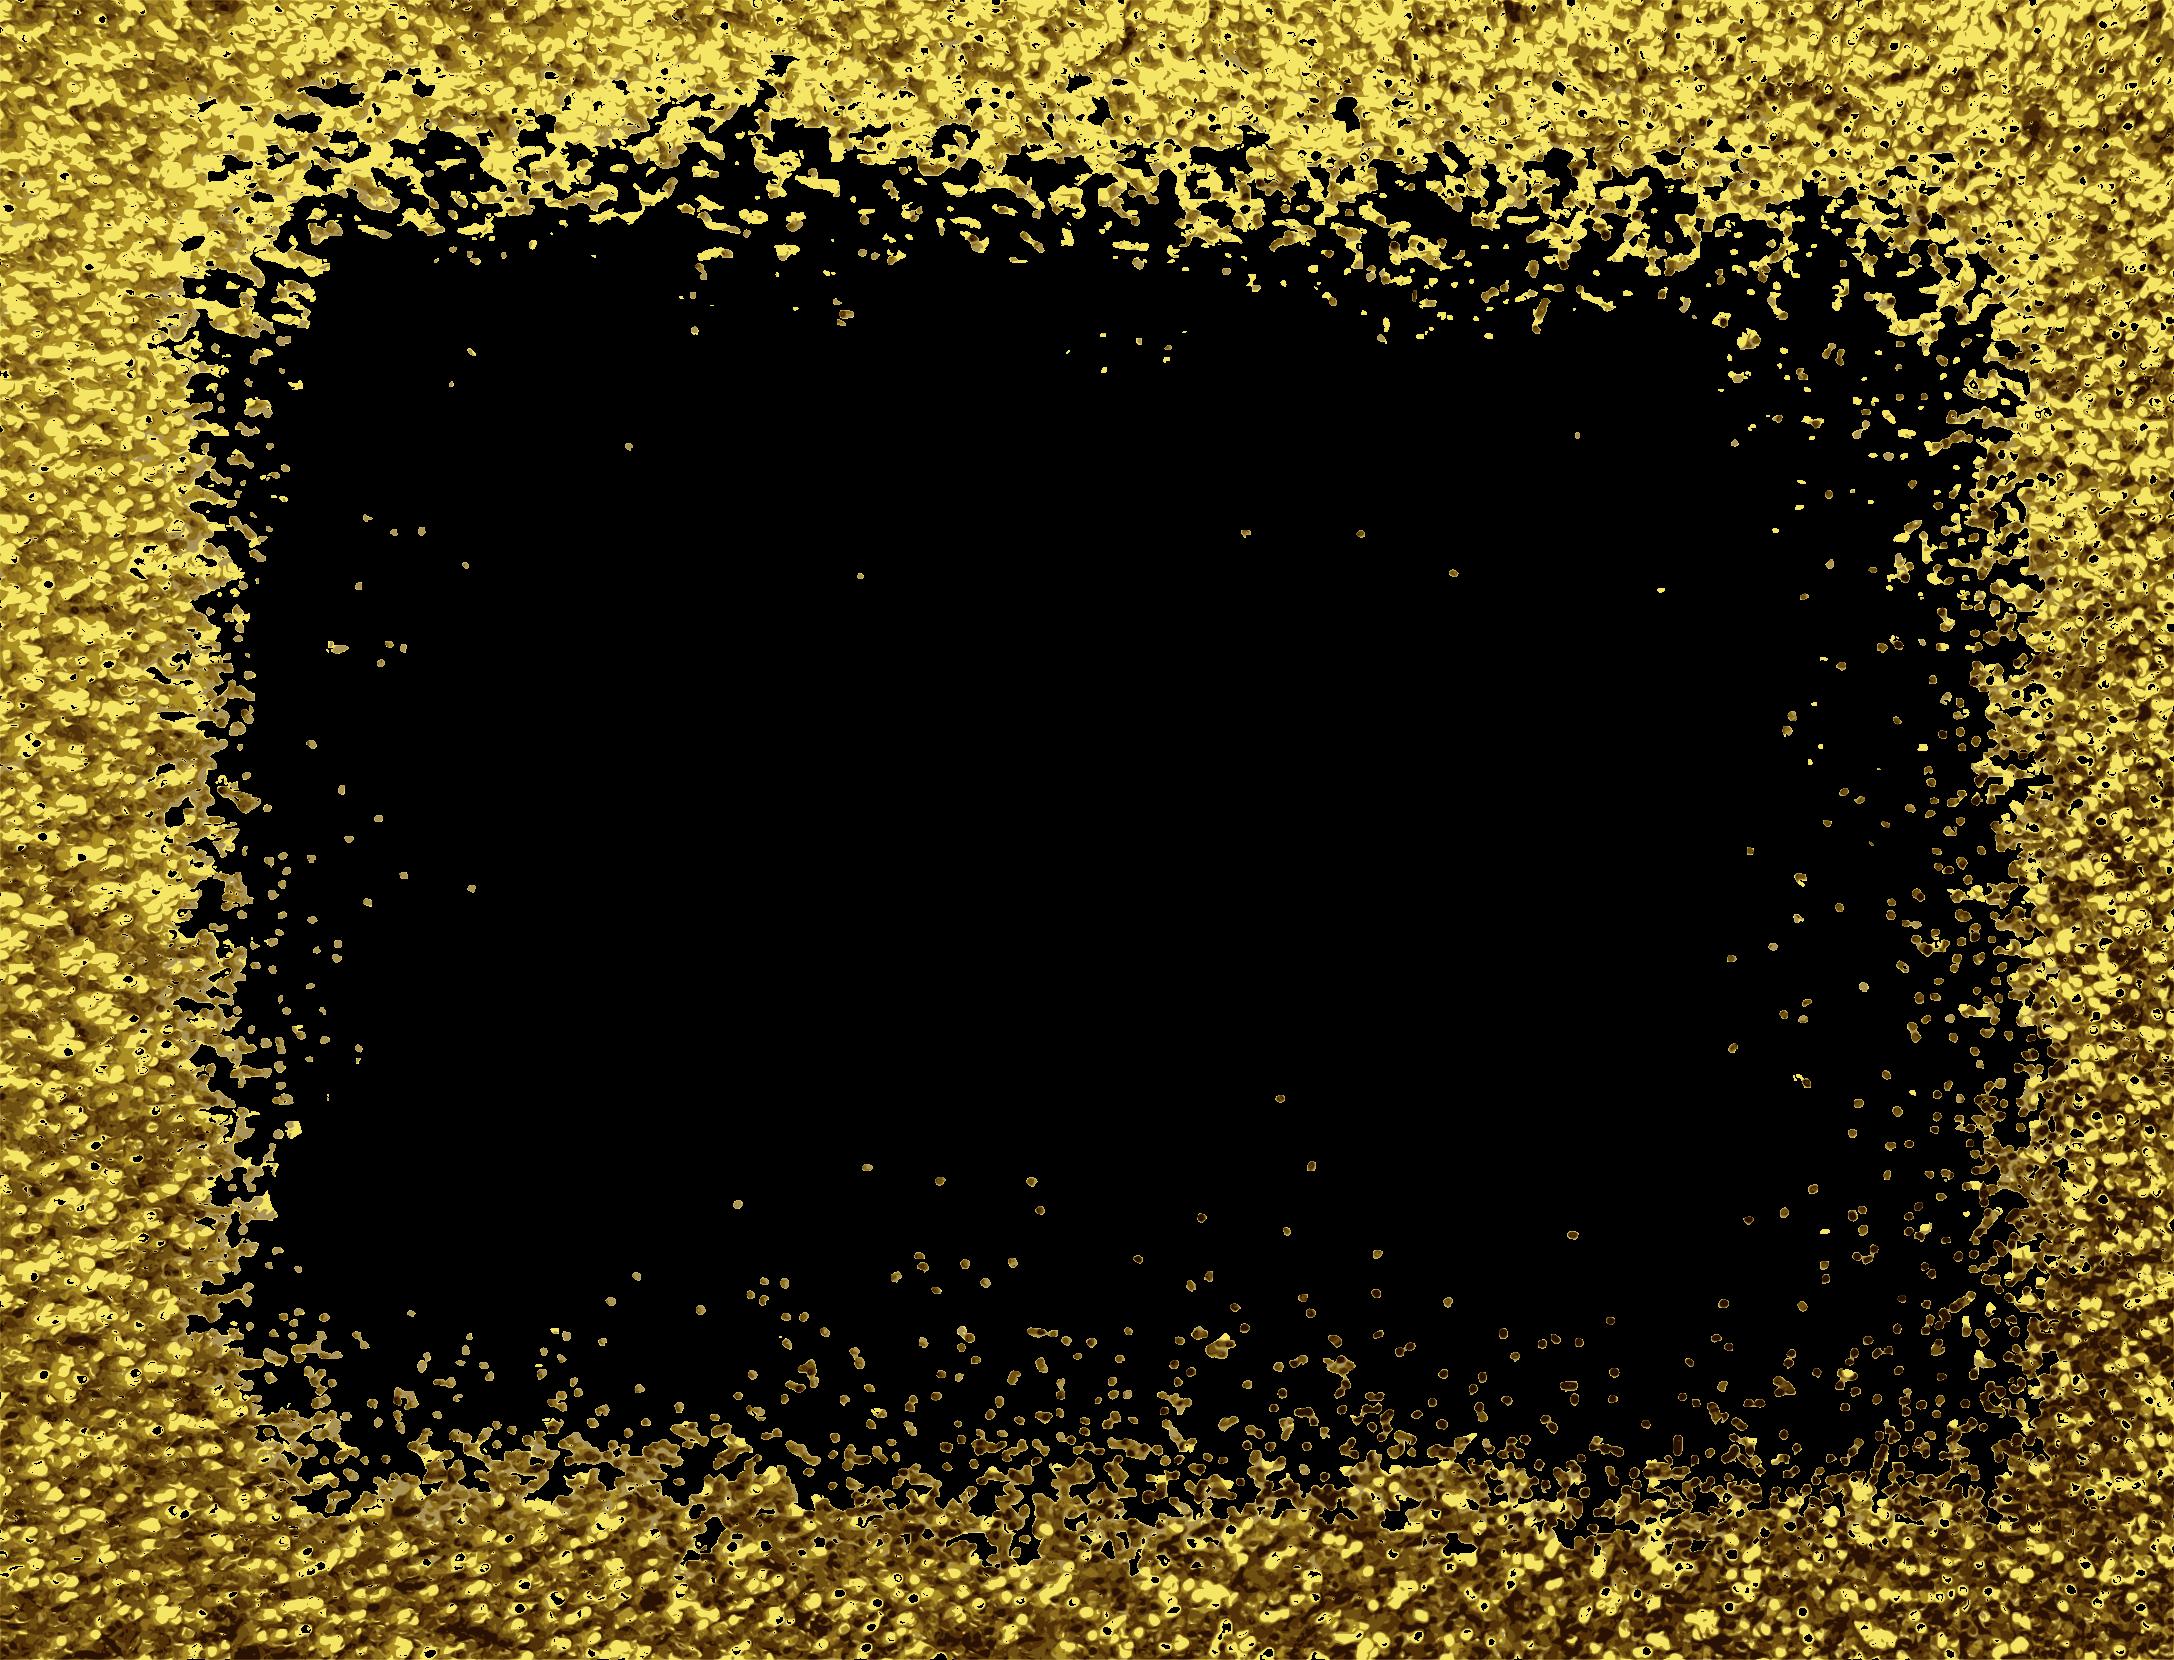 gold-glitter-frame-2.png